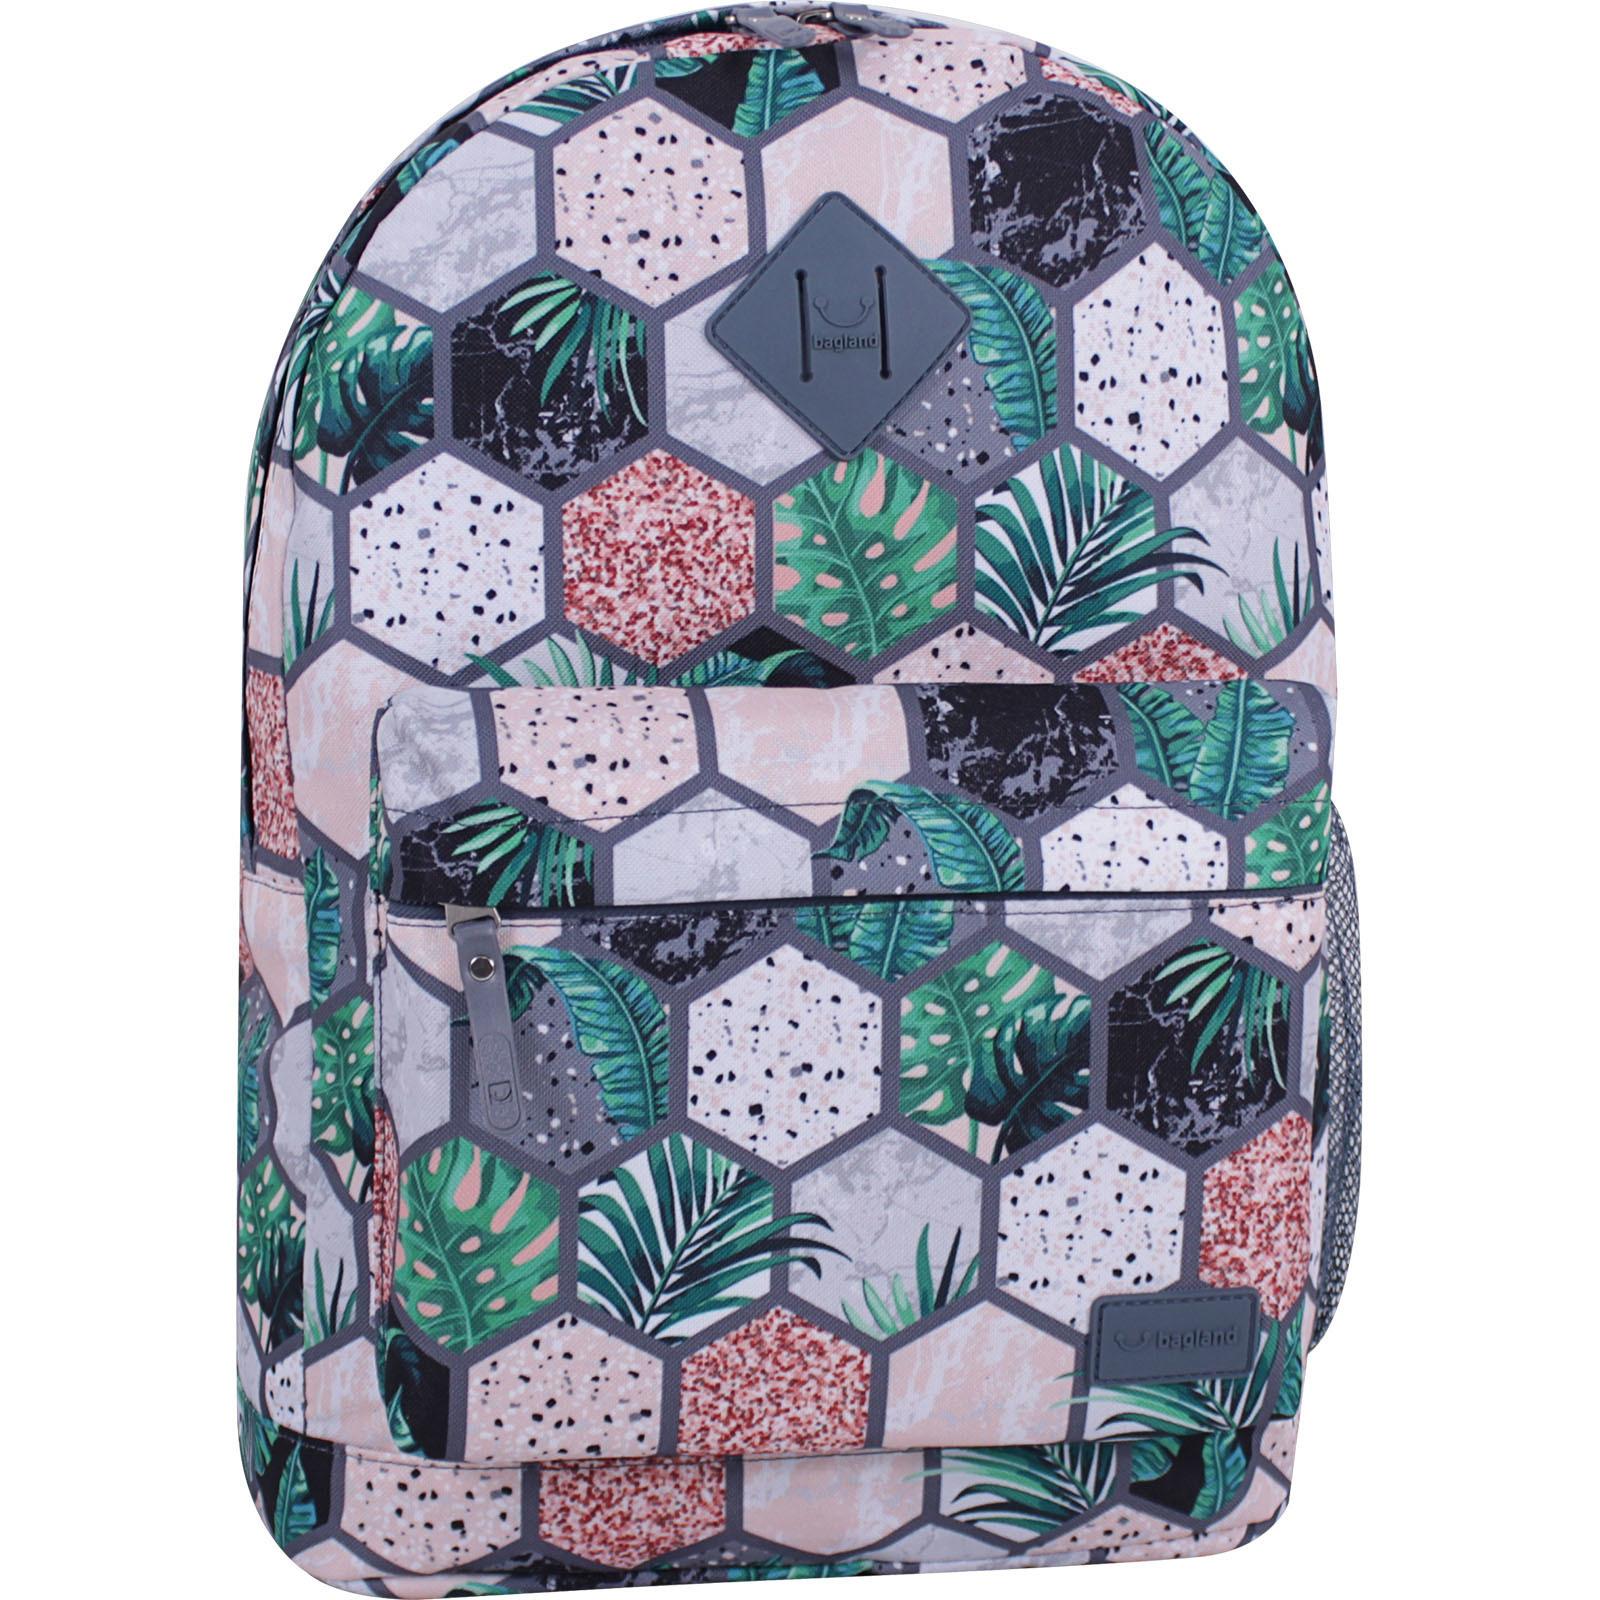 Молодежные рюкзаки Рюкзак Bagland Молодежный 17 л. сублимация 757 (00533664) IMG_7001_суб.757_-1600.jpg